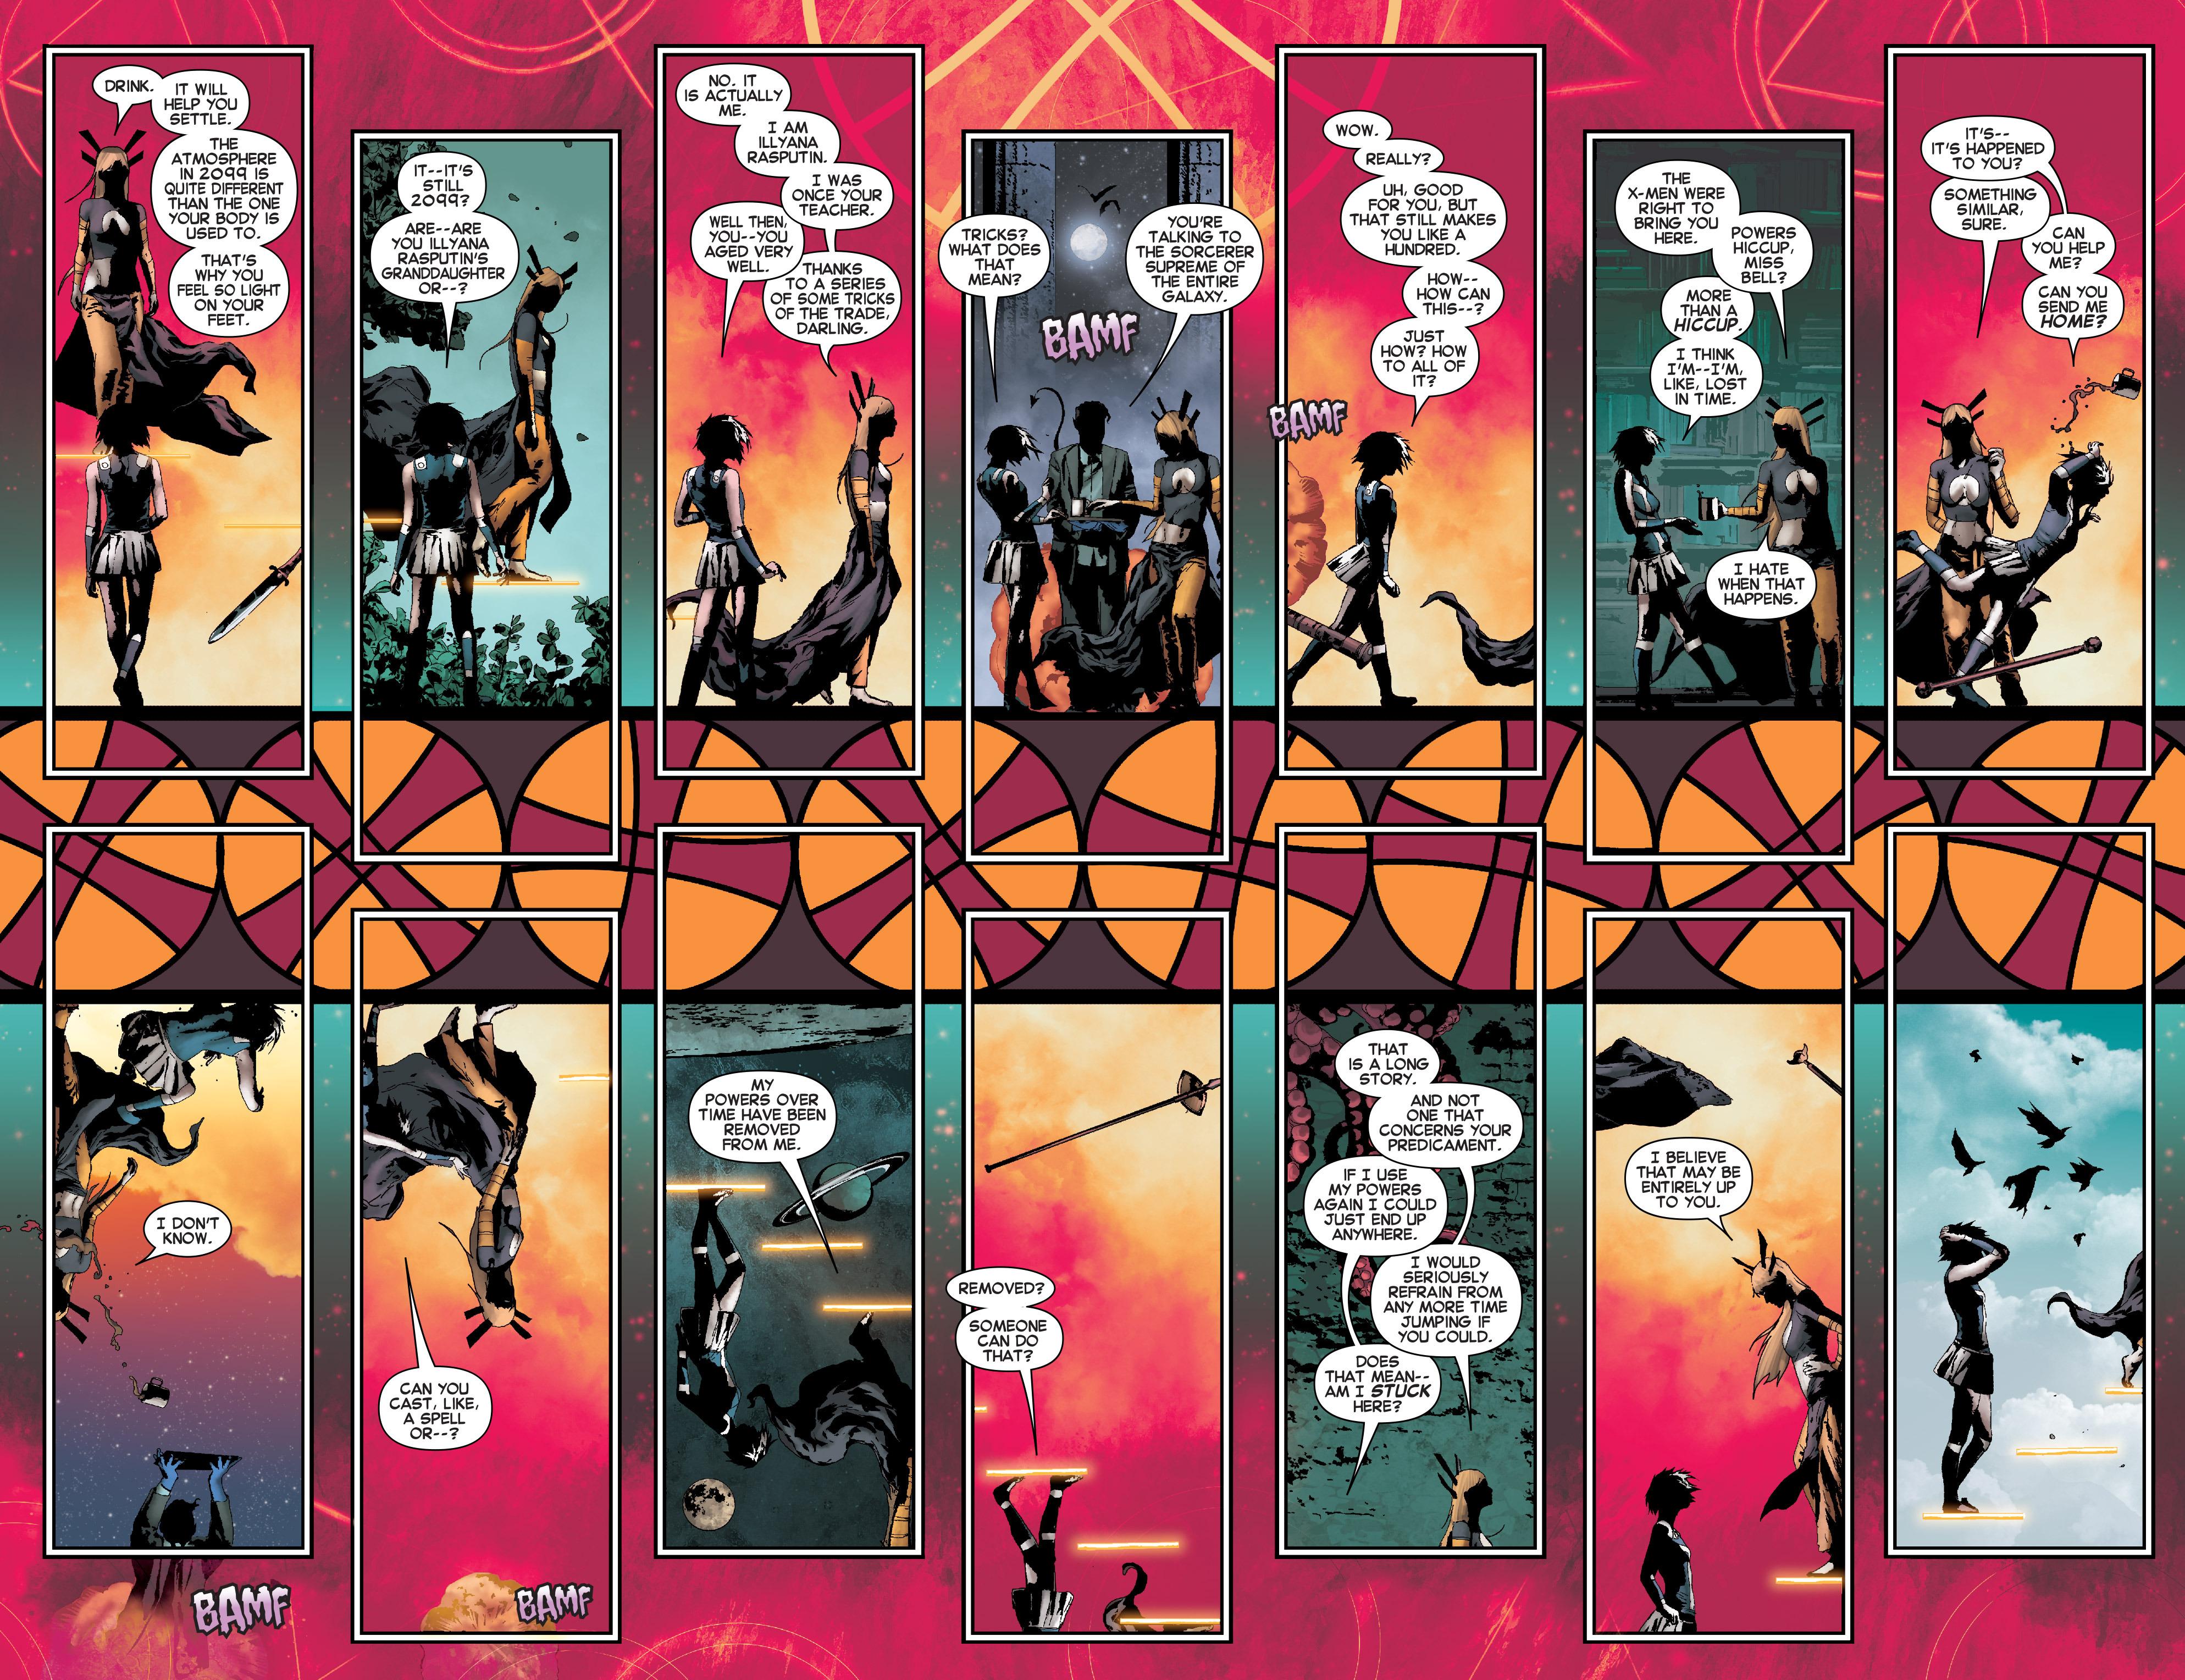 Read online Uncanny X-Men (2013) comic -  Issue # Annual 1 - 18